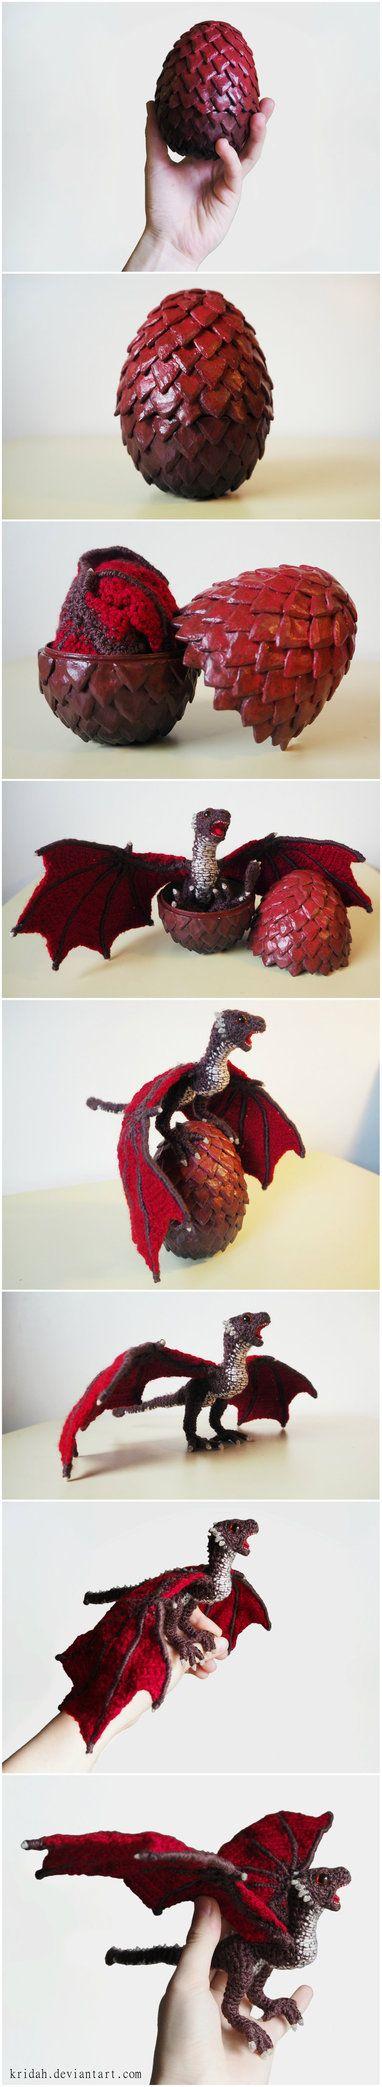 best 25 baby dragon ideas on pinterest ice dragon dragon art